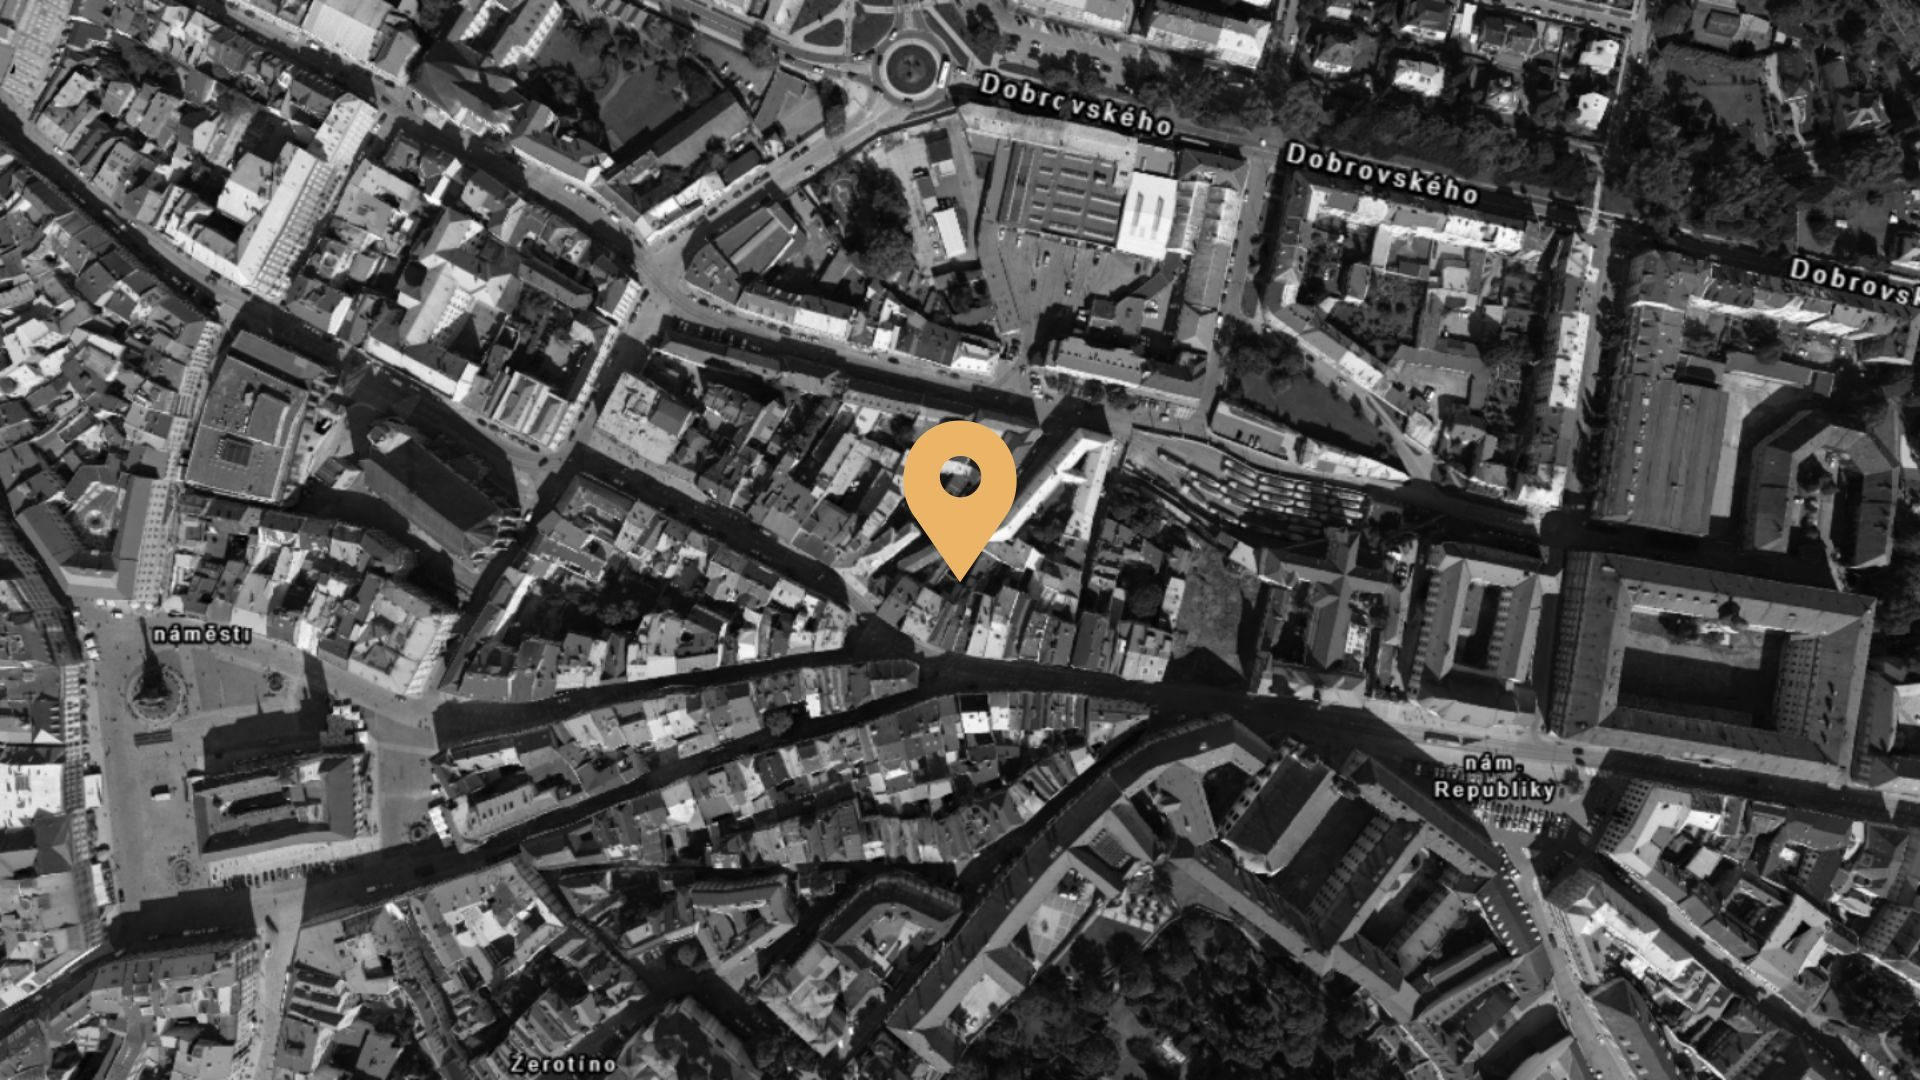 http://spolekspas.cz/wp-content/uploads/2018/08/pic_map_5-1920x1080.jpg